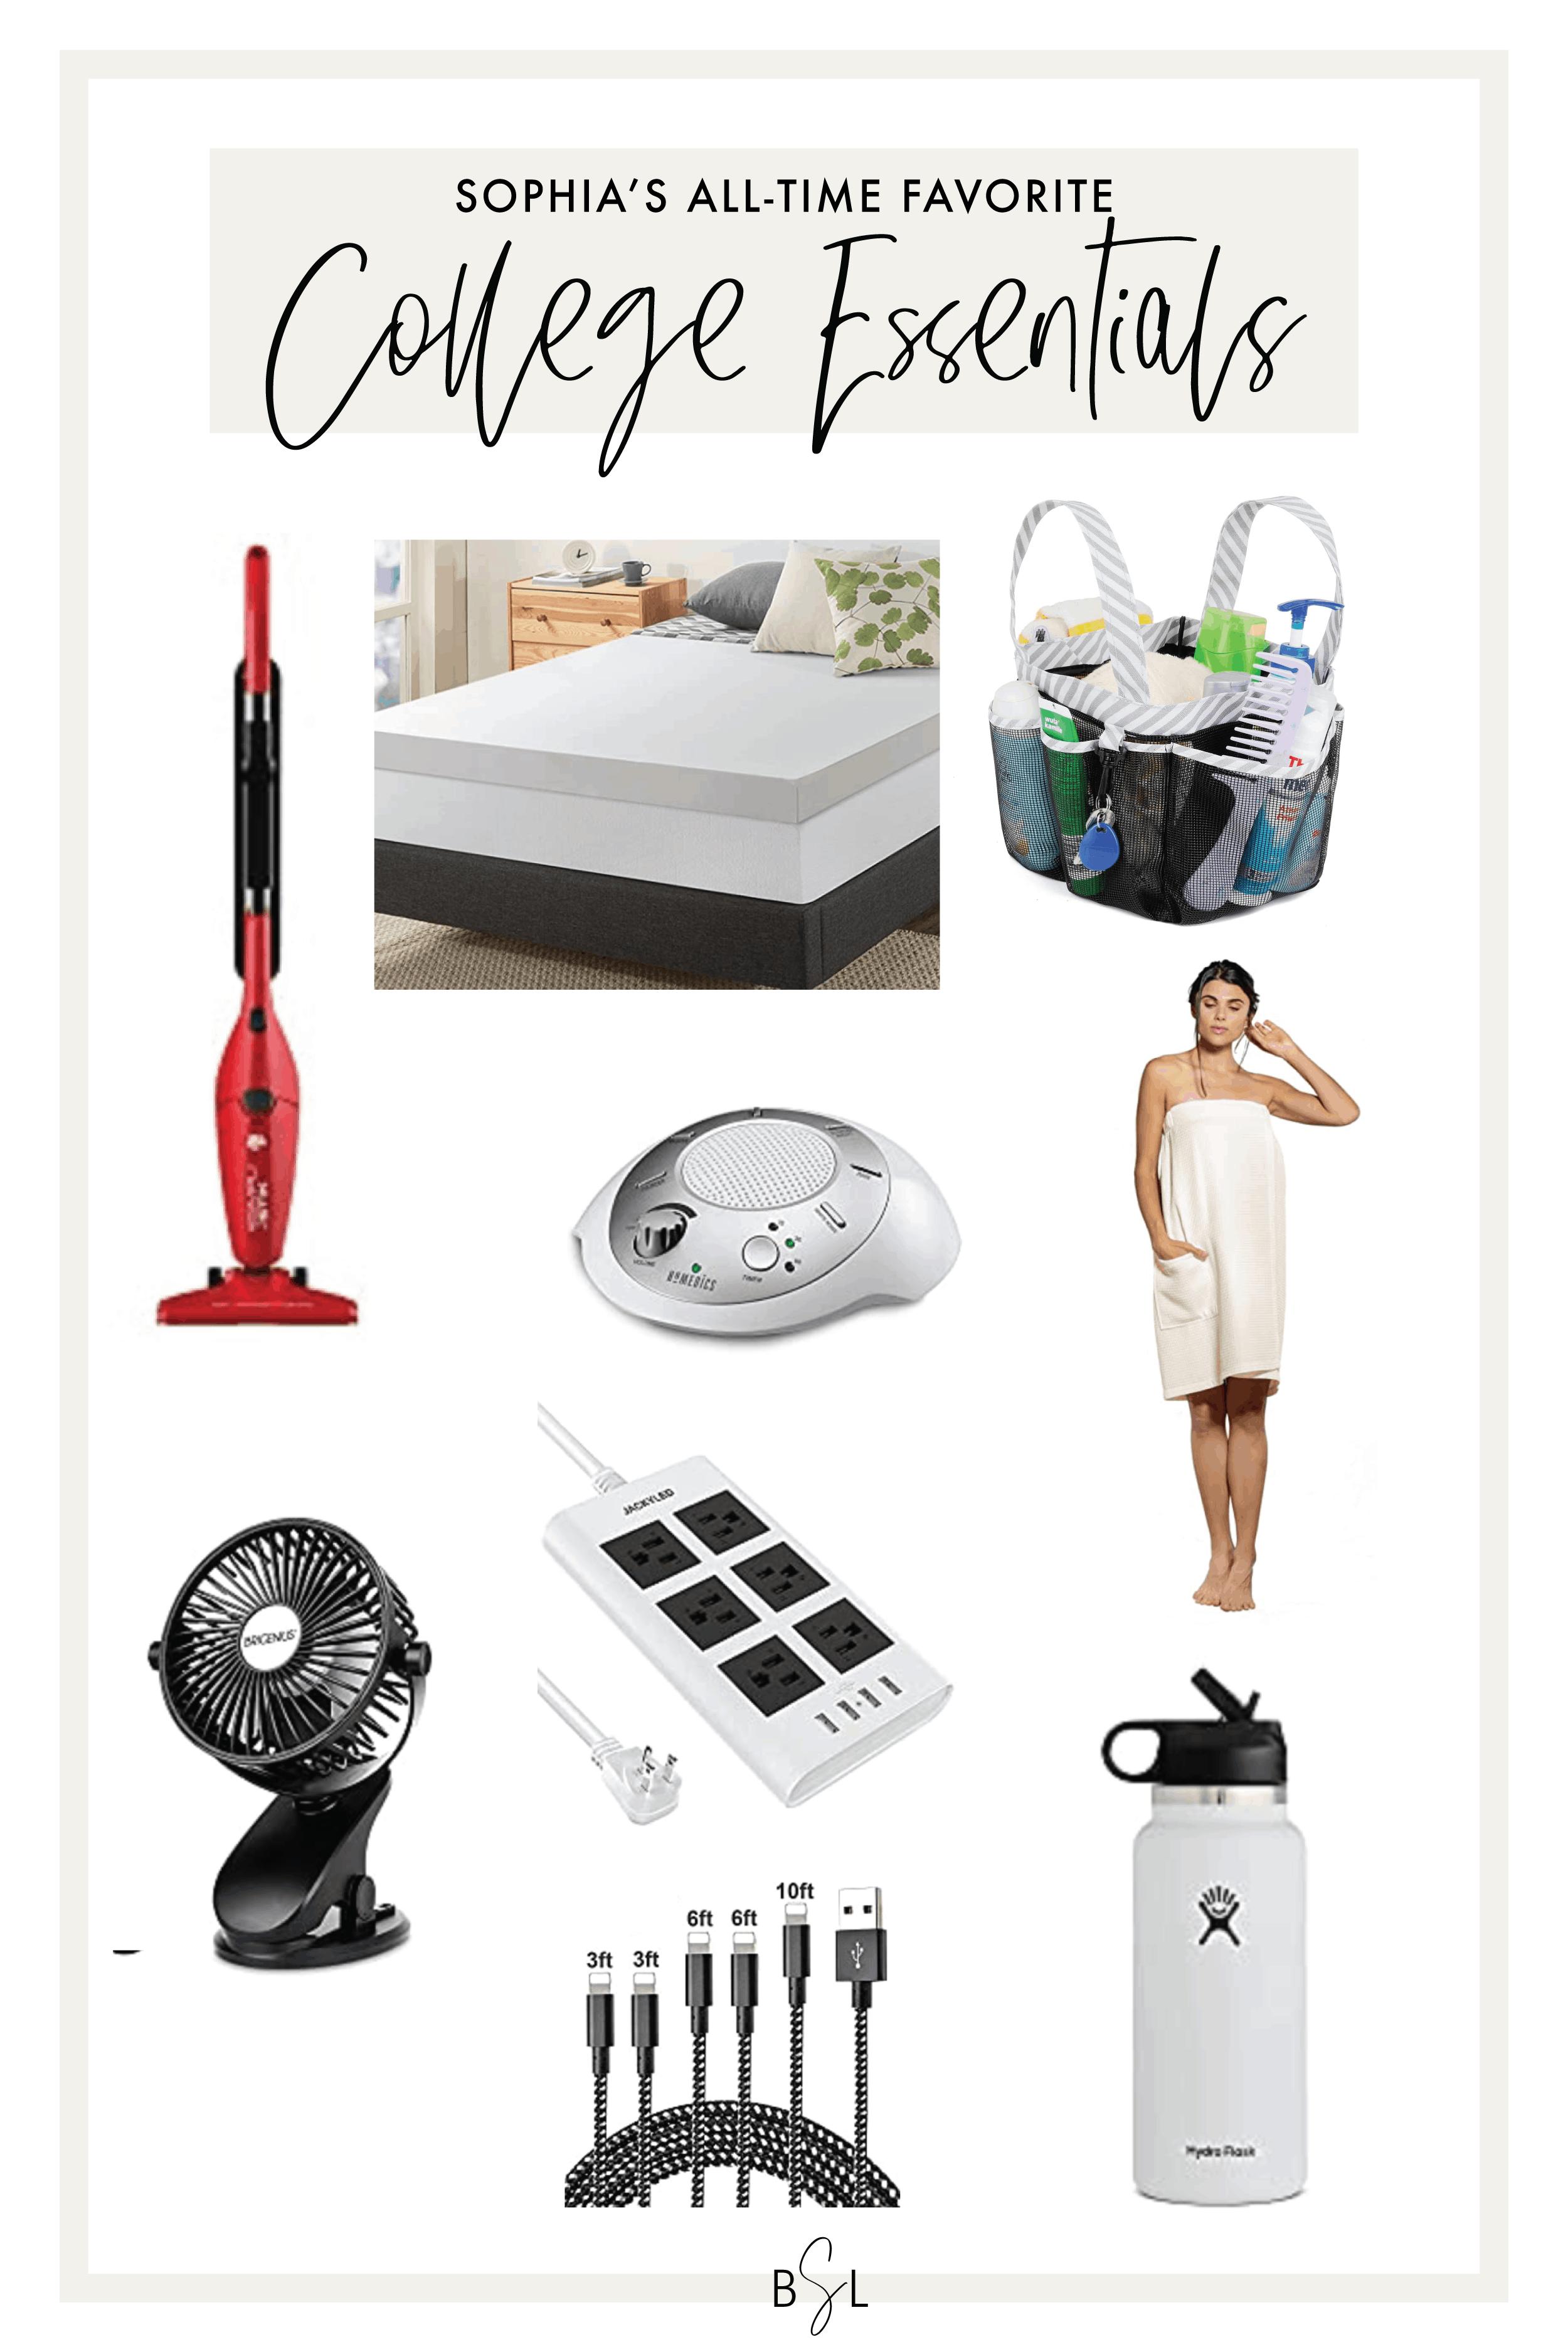 by sophia lee college essentials